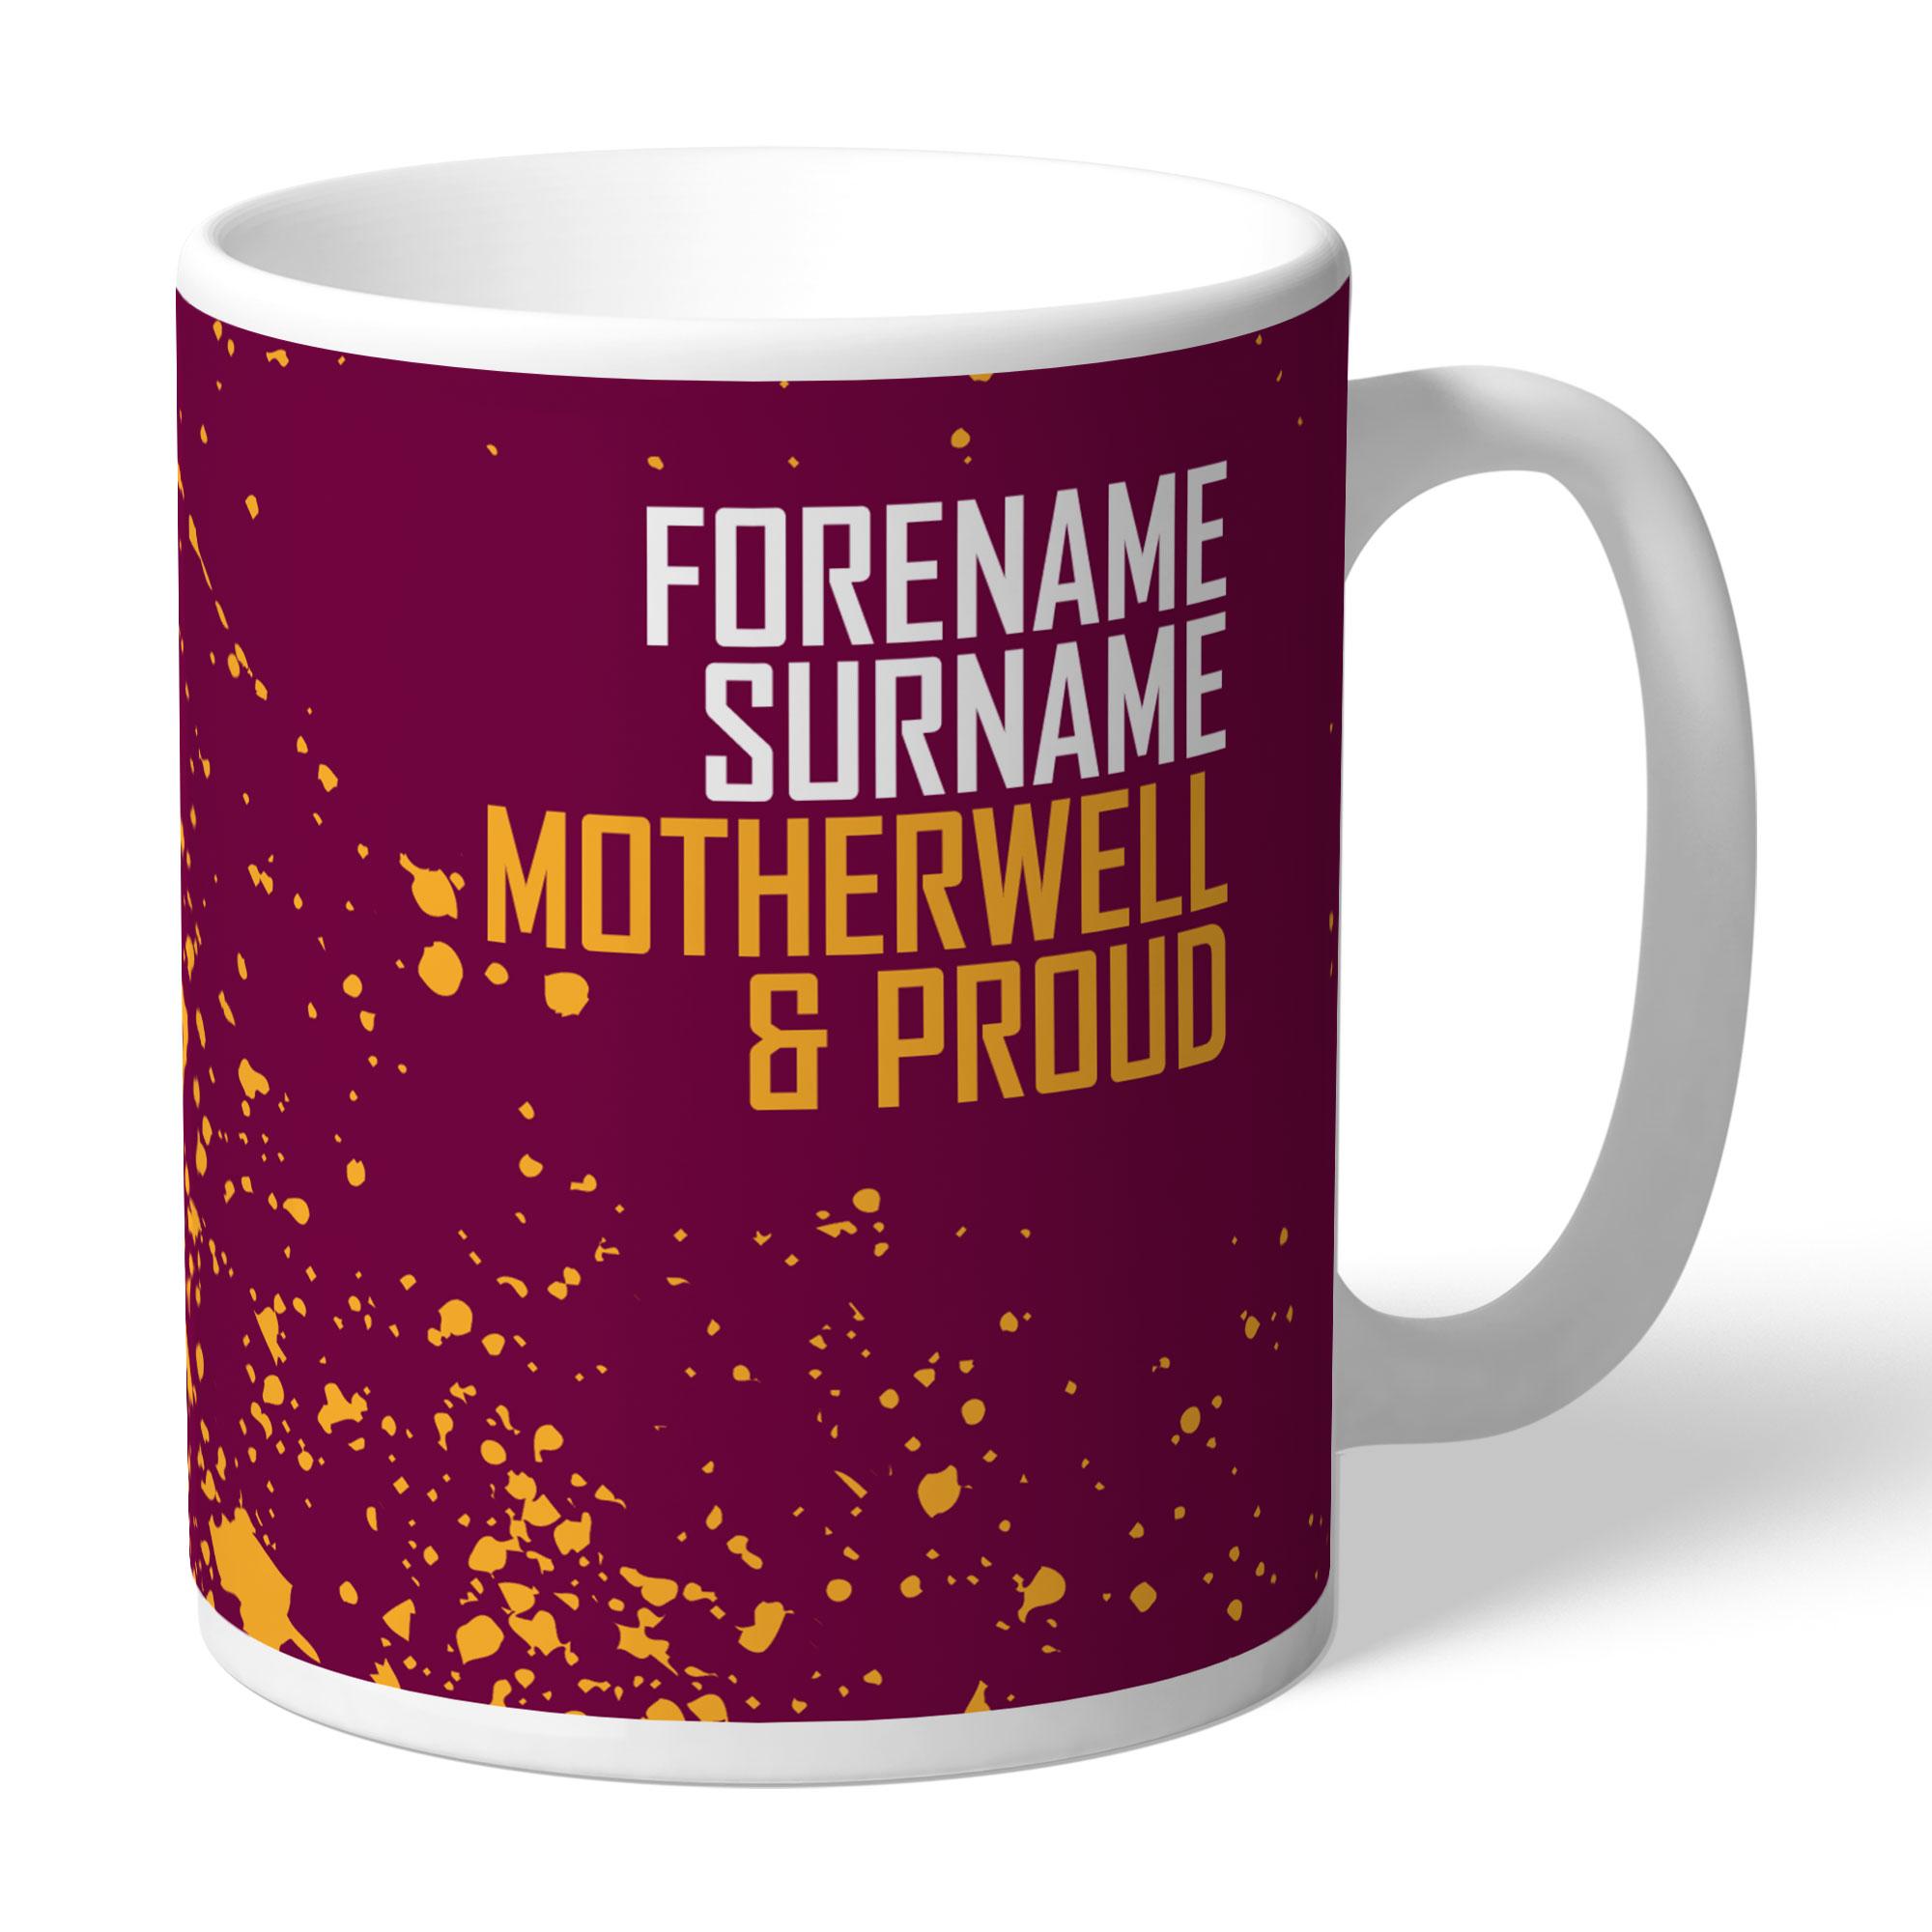 Motherwell FC Proud Mug